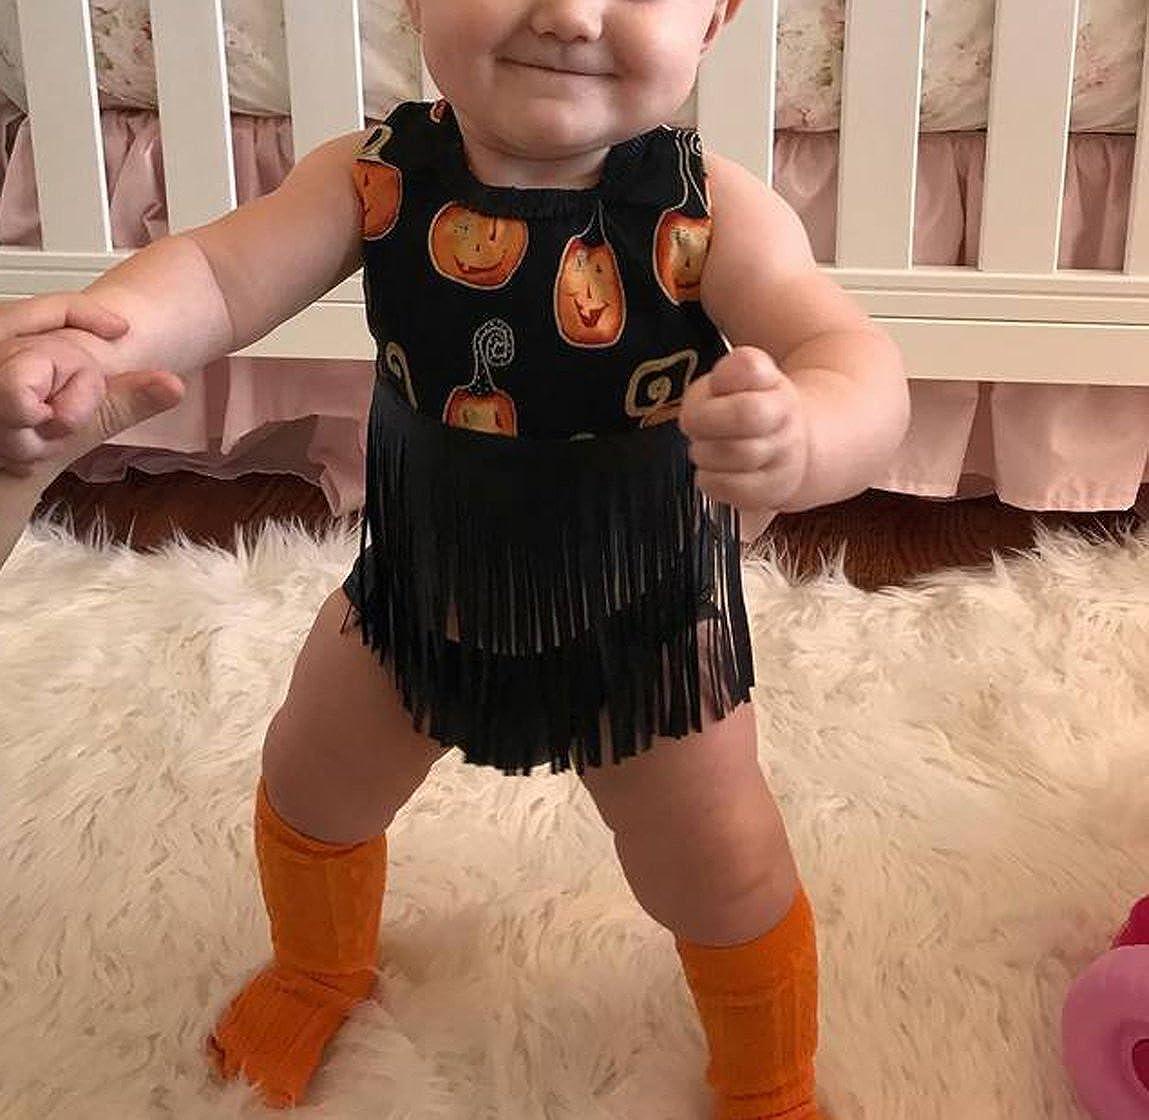 2Pcs Baby Halloween Outfit Set Newborn Infant Girls Sleeveless Backless Halter Pumpkin Tassels Tank Tops Orange Shorts